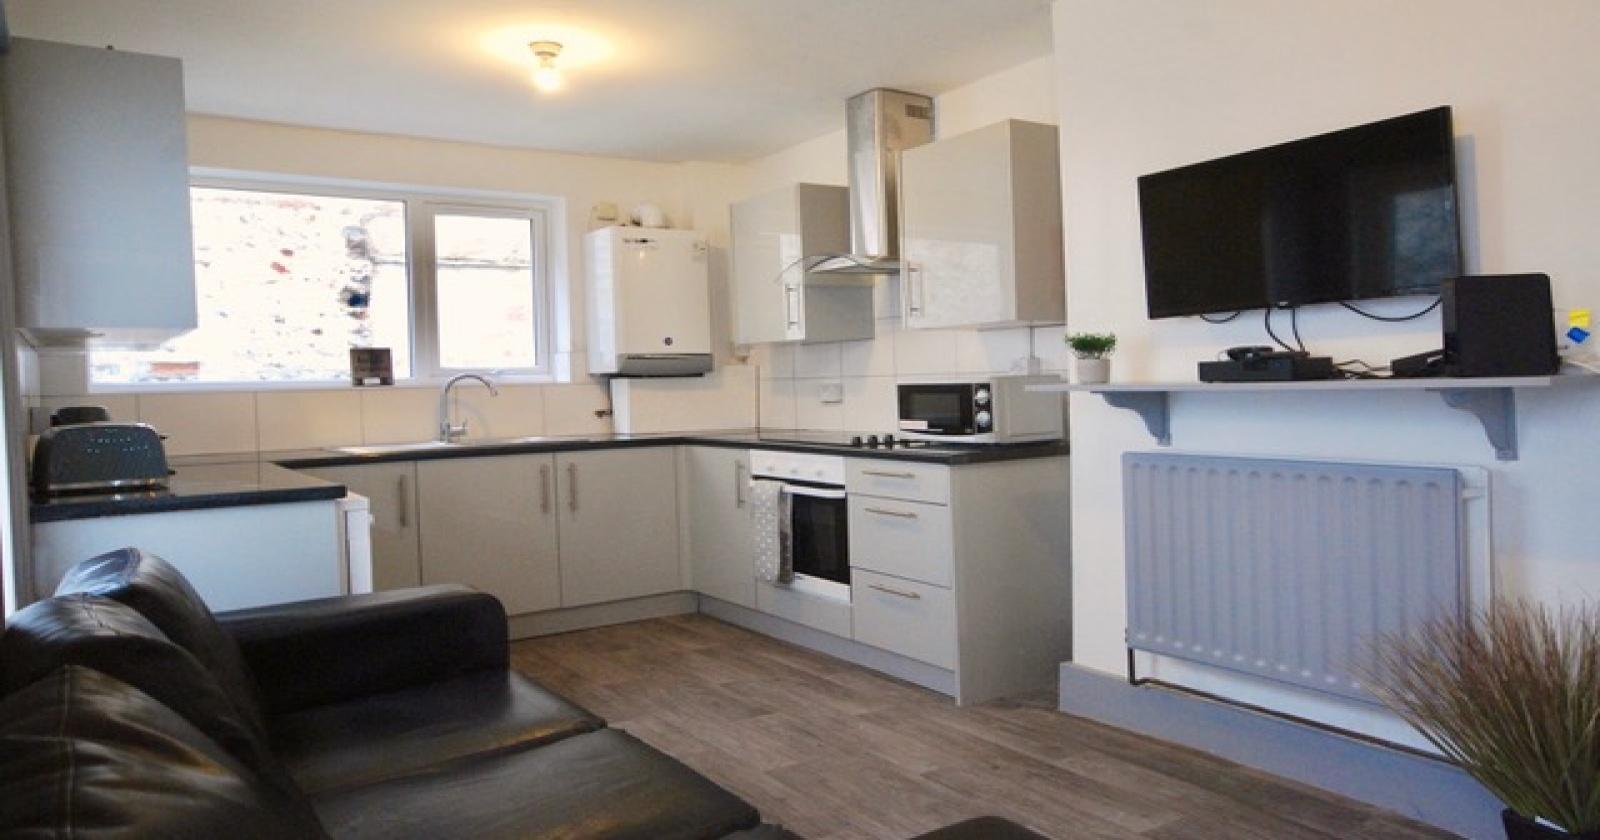 Queens Park Road, Brighton, BN2 0GJ, 6 Bedrooms Bedrooms, ,2 BathroomsBathrooms,House,For Rent,Queens Park Road,1017